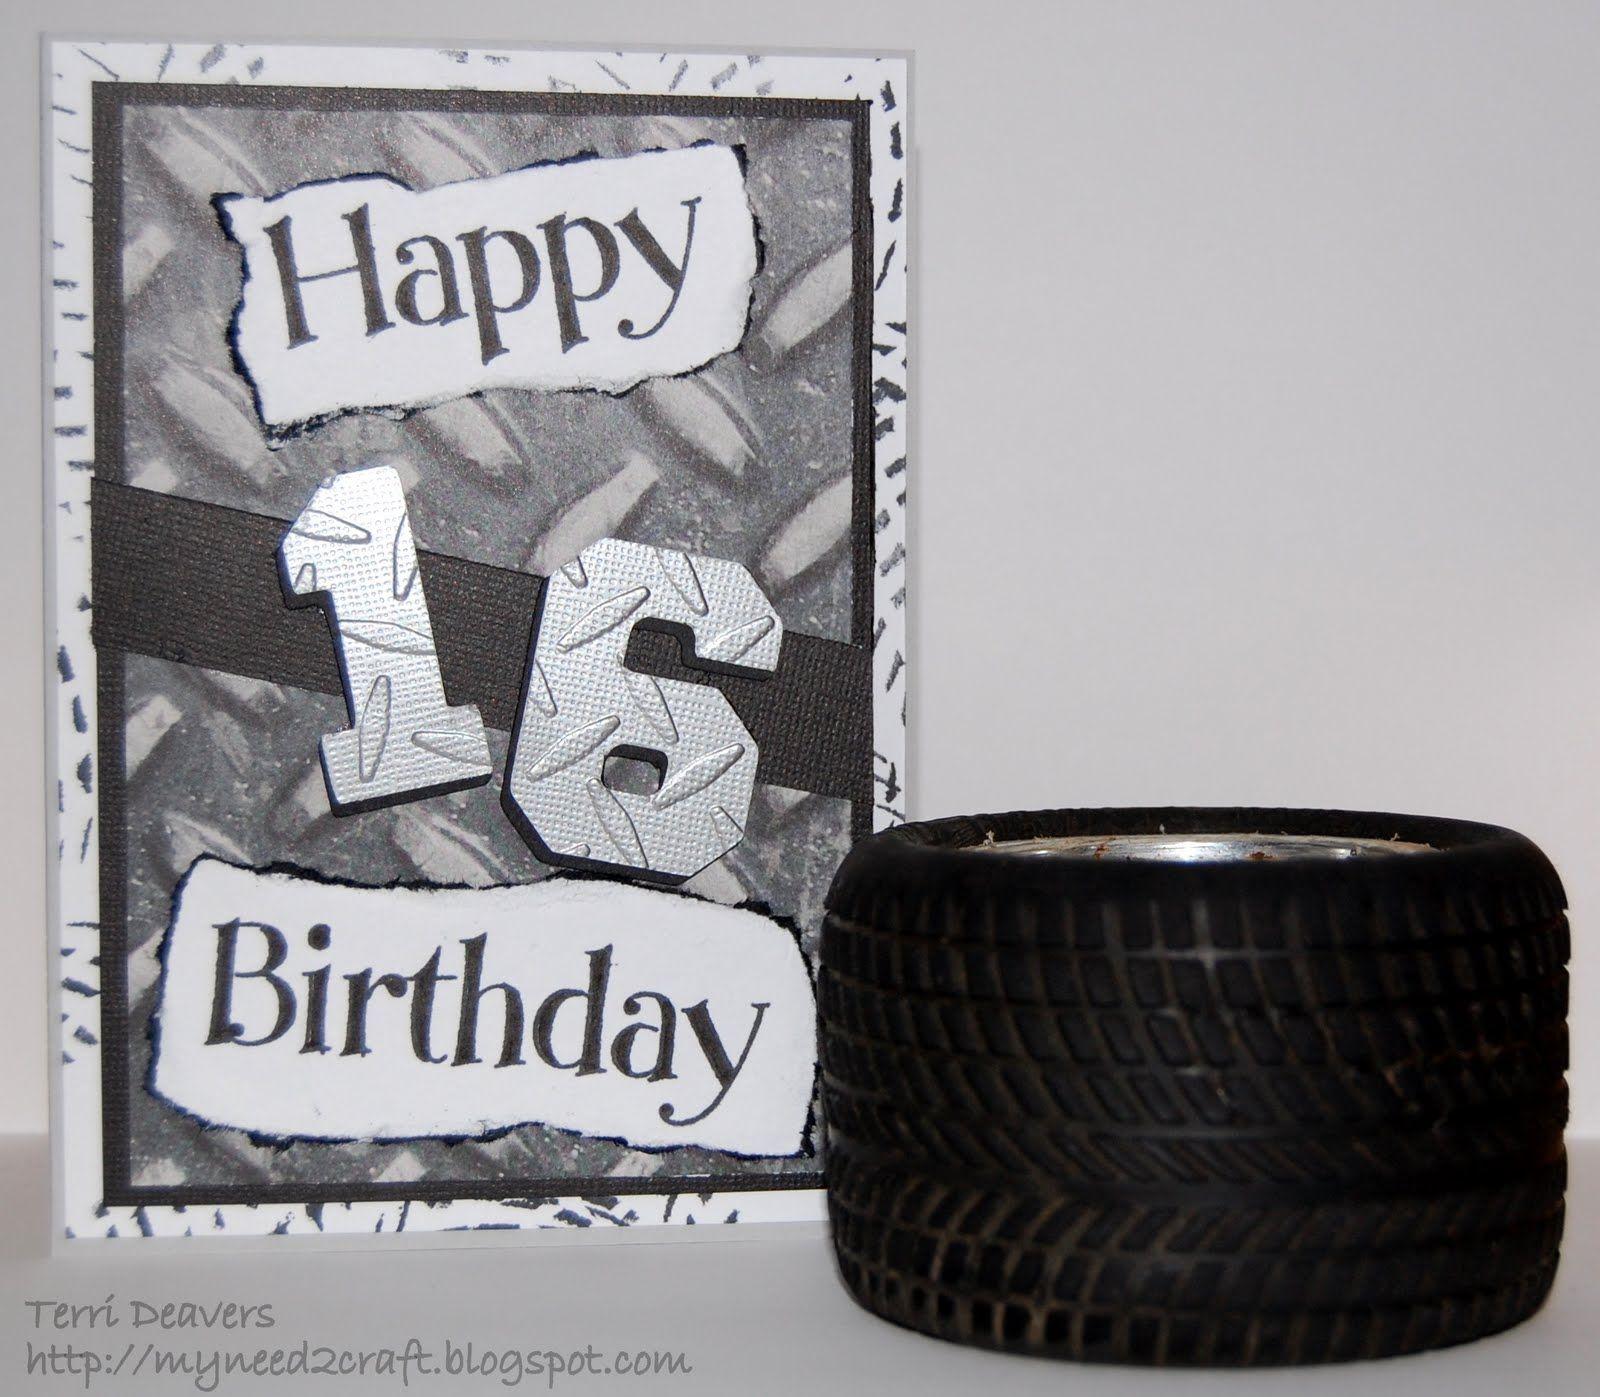 Myneed2craft My Nephew S 16th Birthday Card 16th Birthday Card Happy 16th Birthday 16th Birthday Gifts